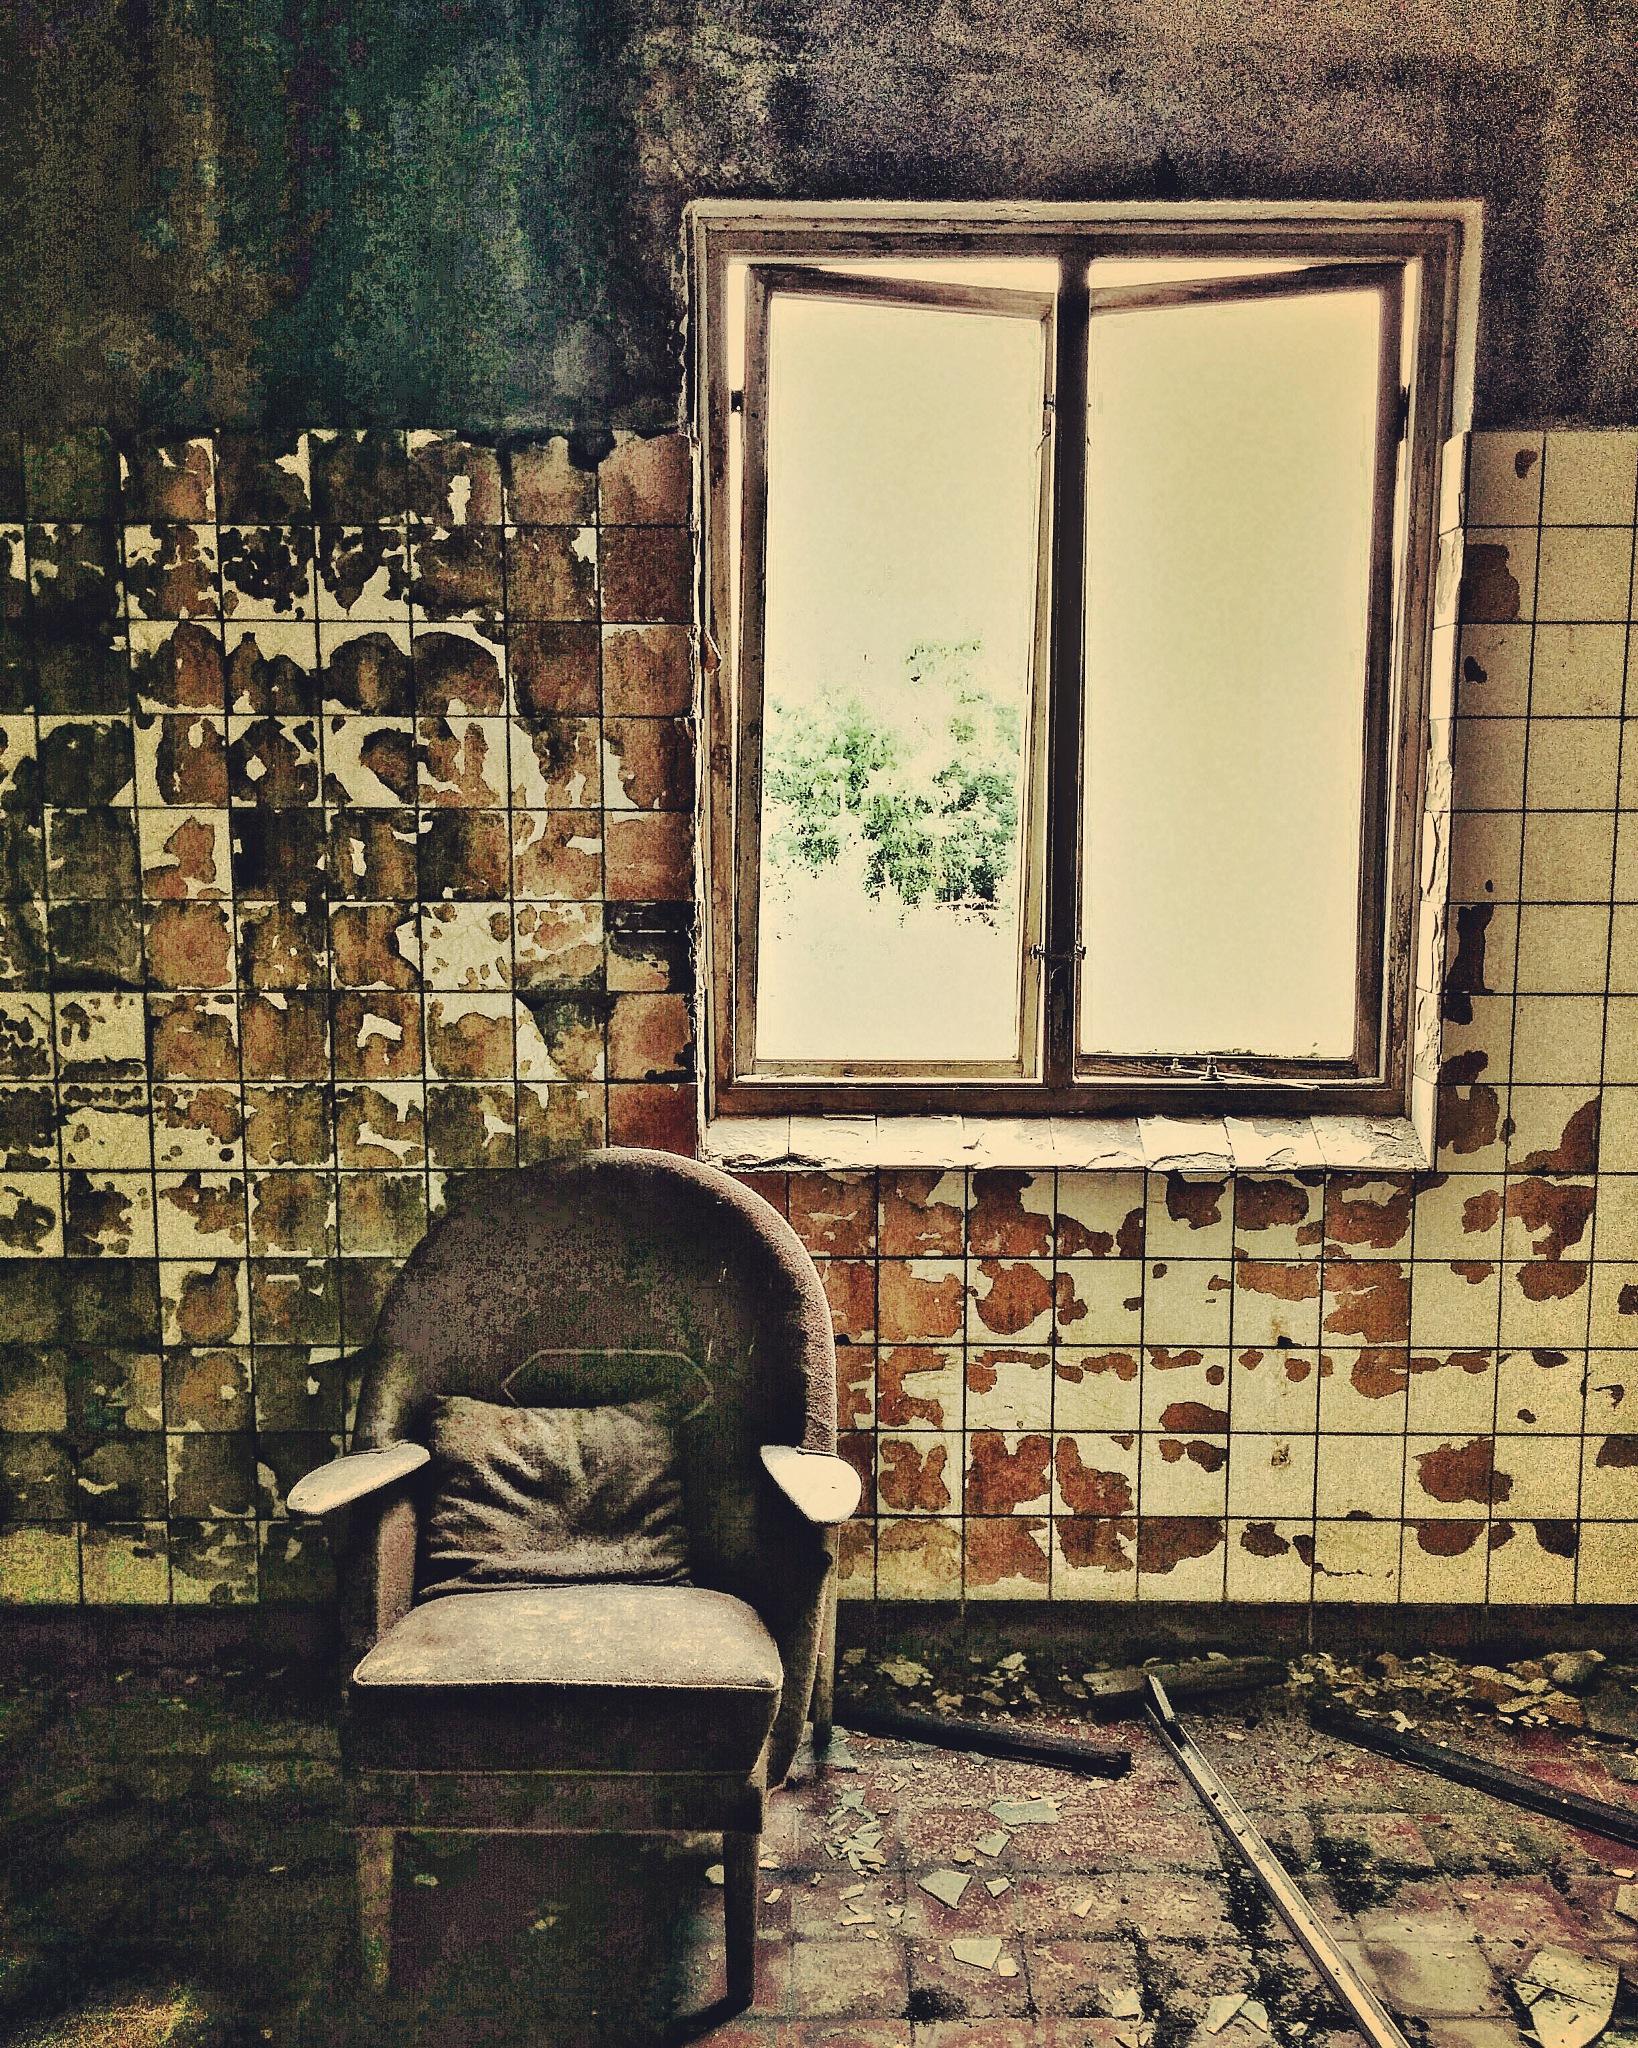 Window Chair by ADifferentTrail